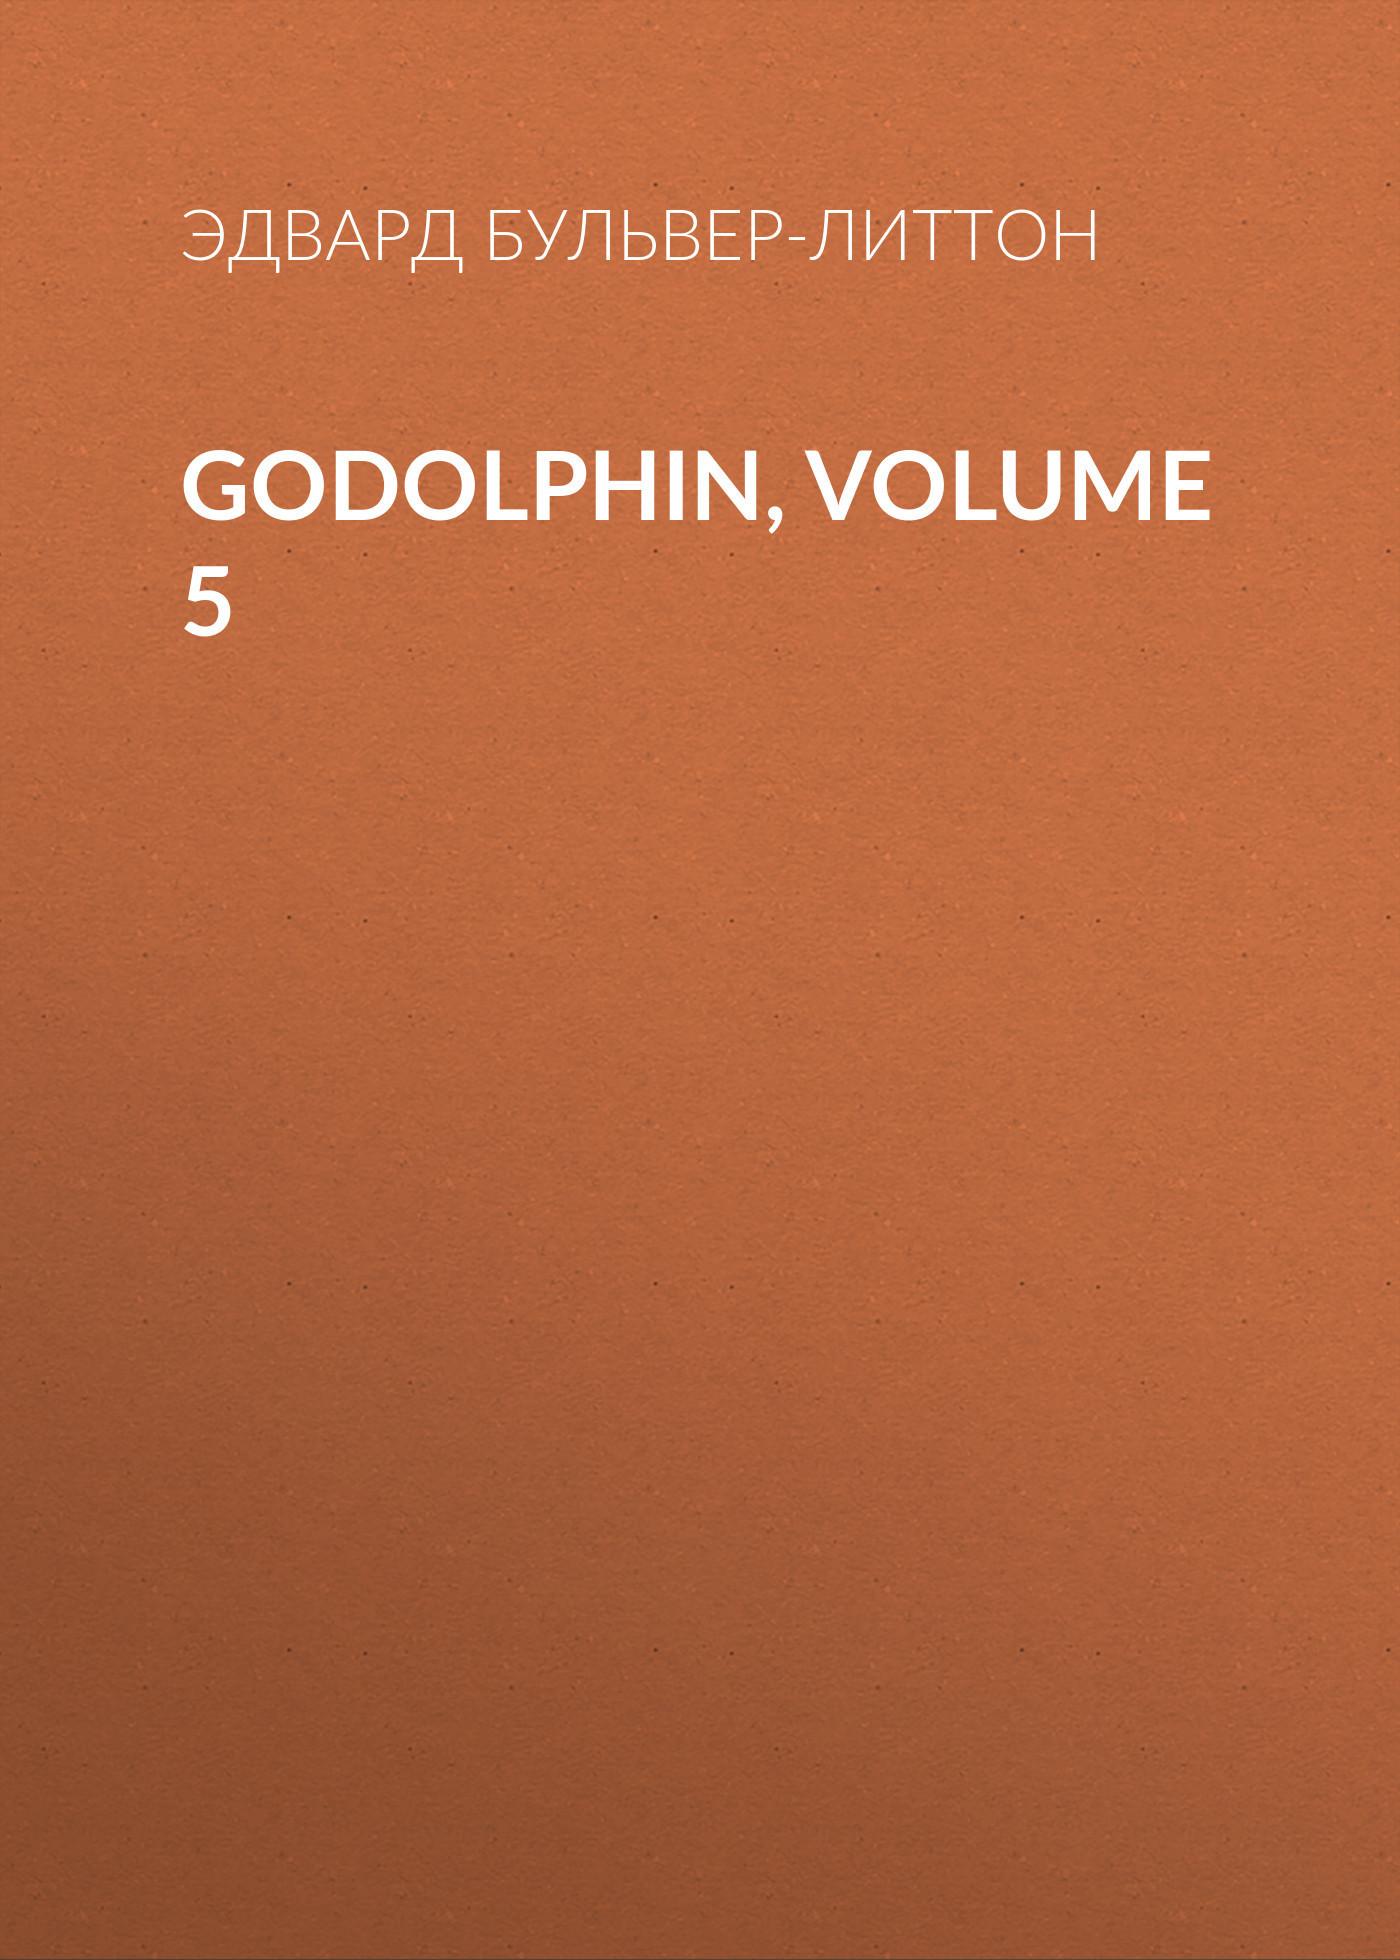 Эдвард Бульвер-Литтон Godolphin, Volume 5 uncanny avengers volume 5